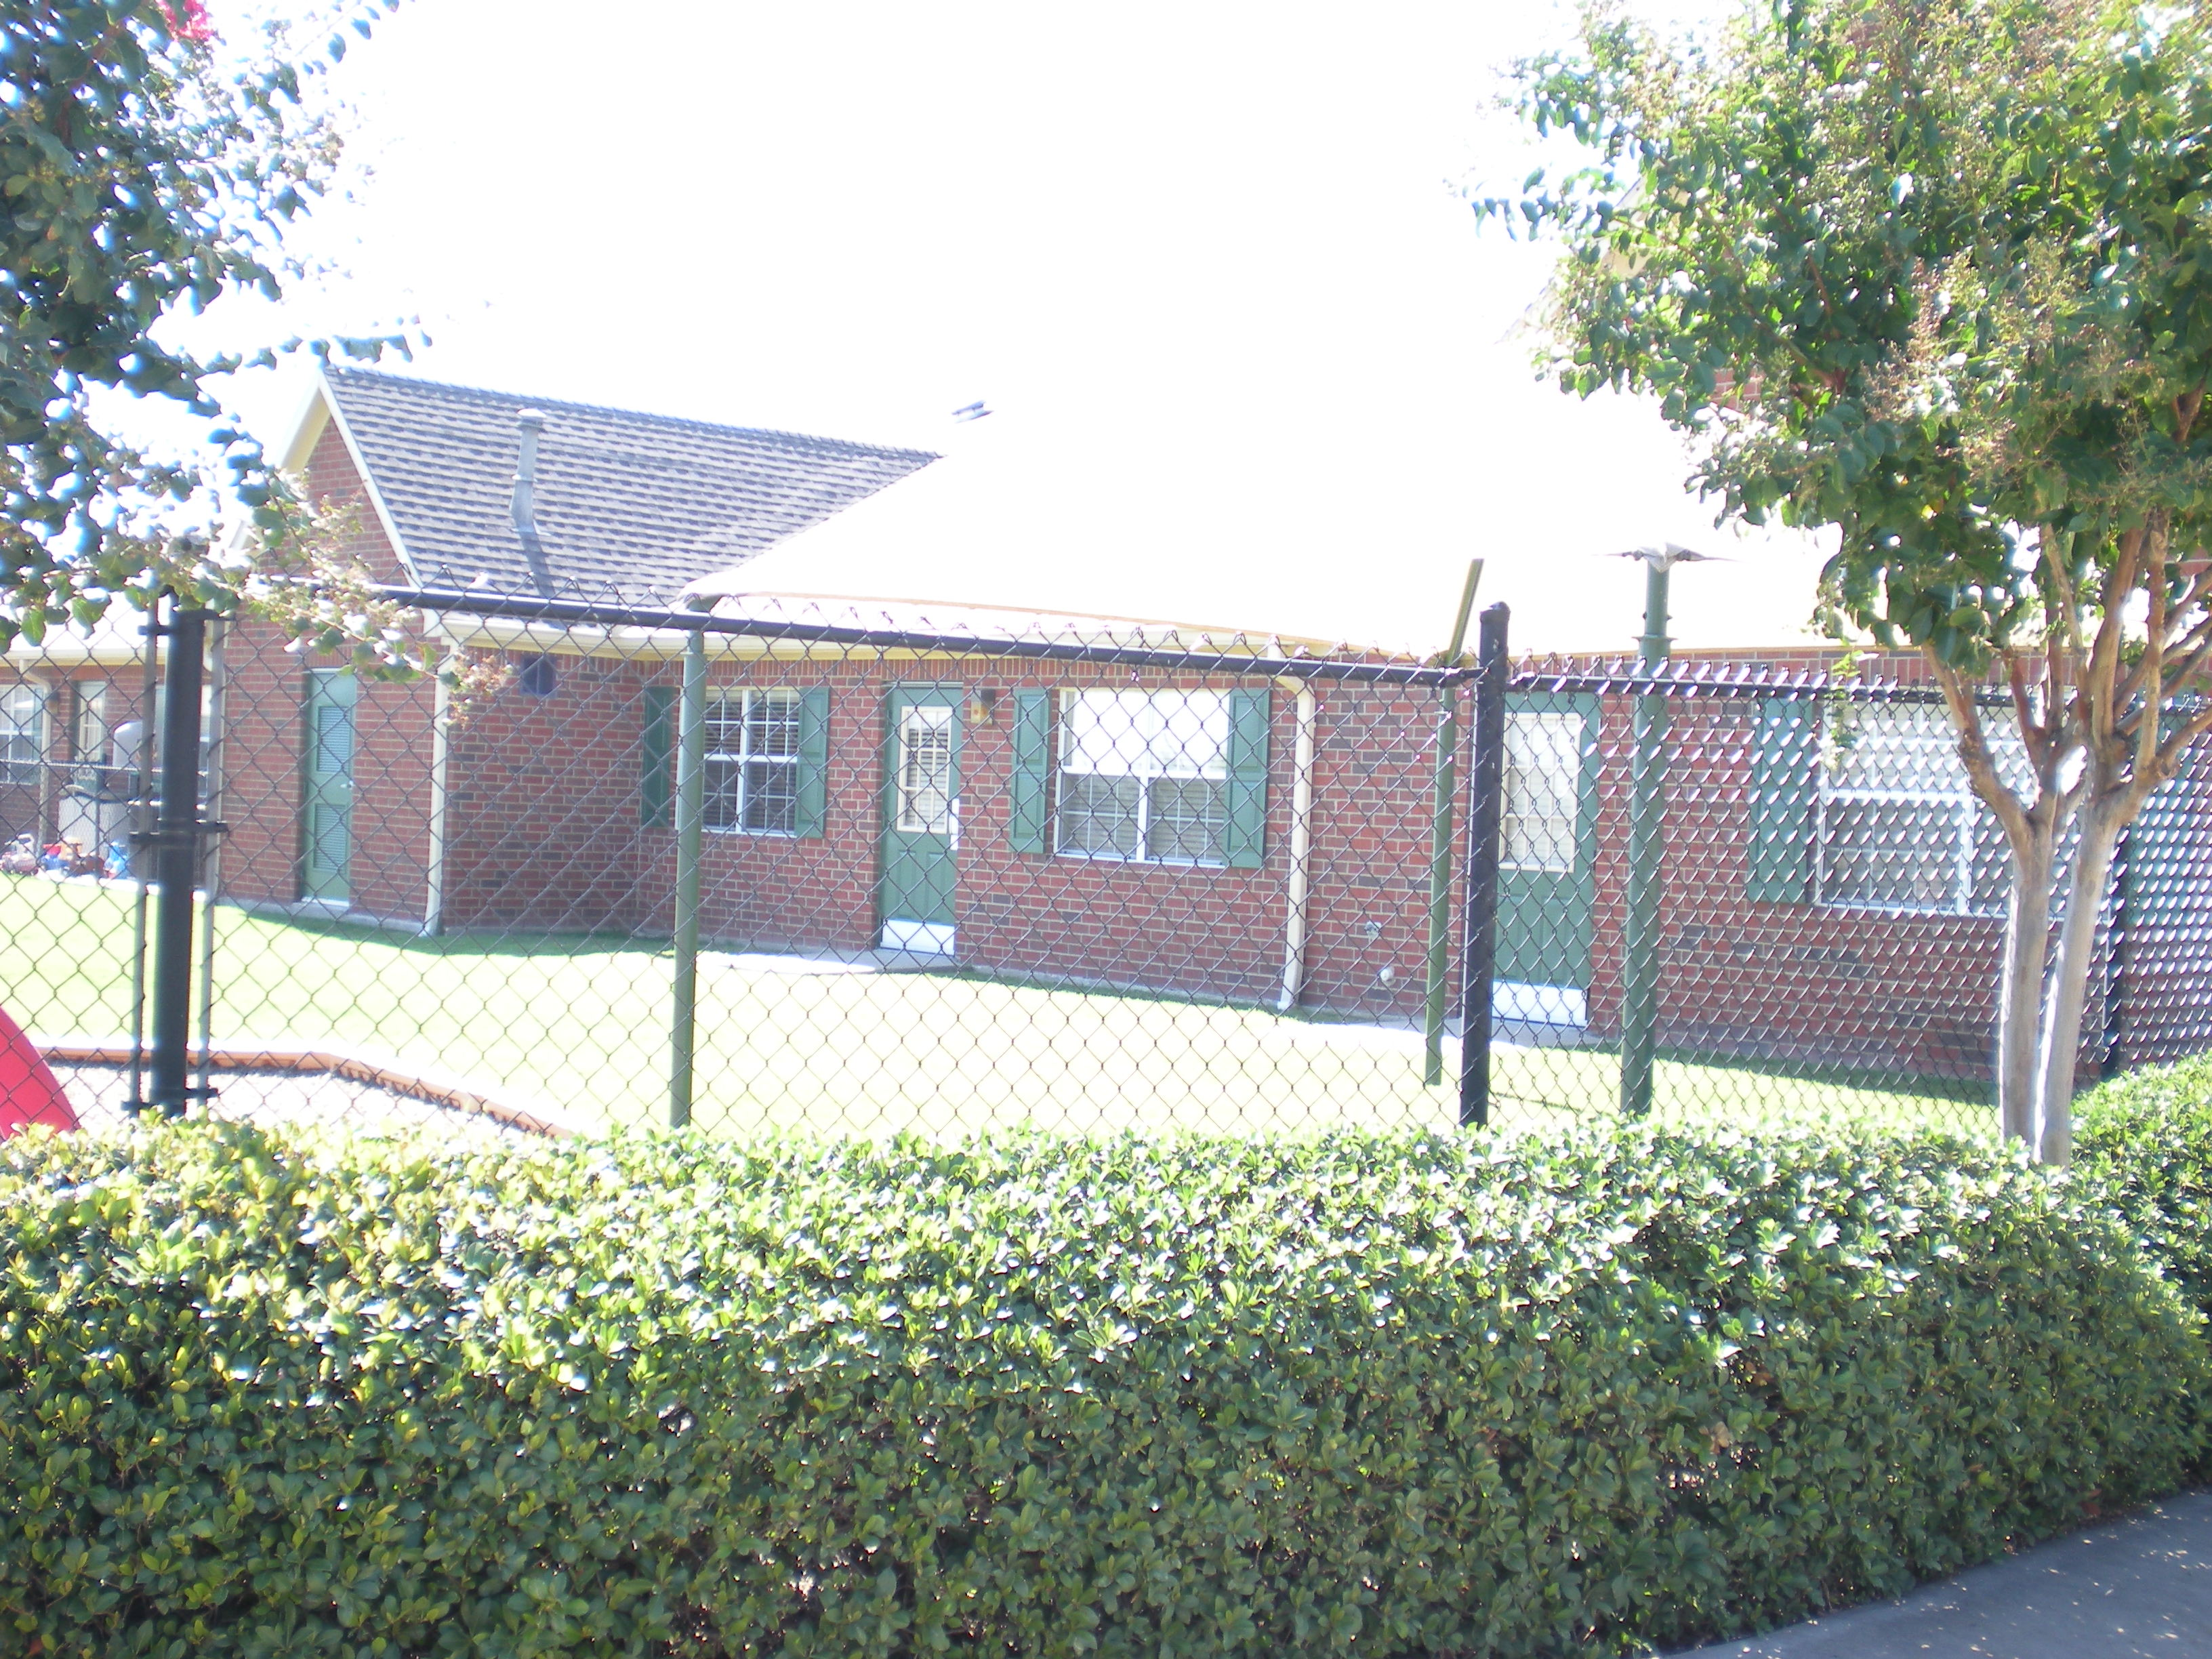 Primrose School of North Lewisville image 2